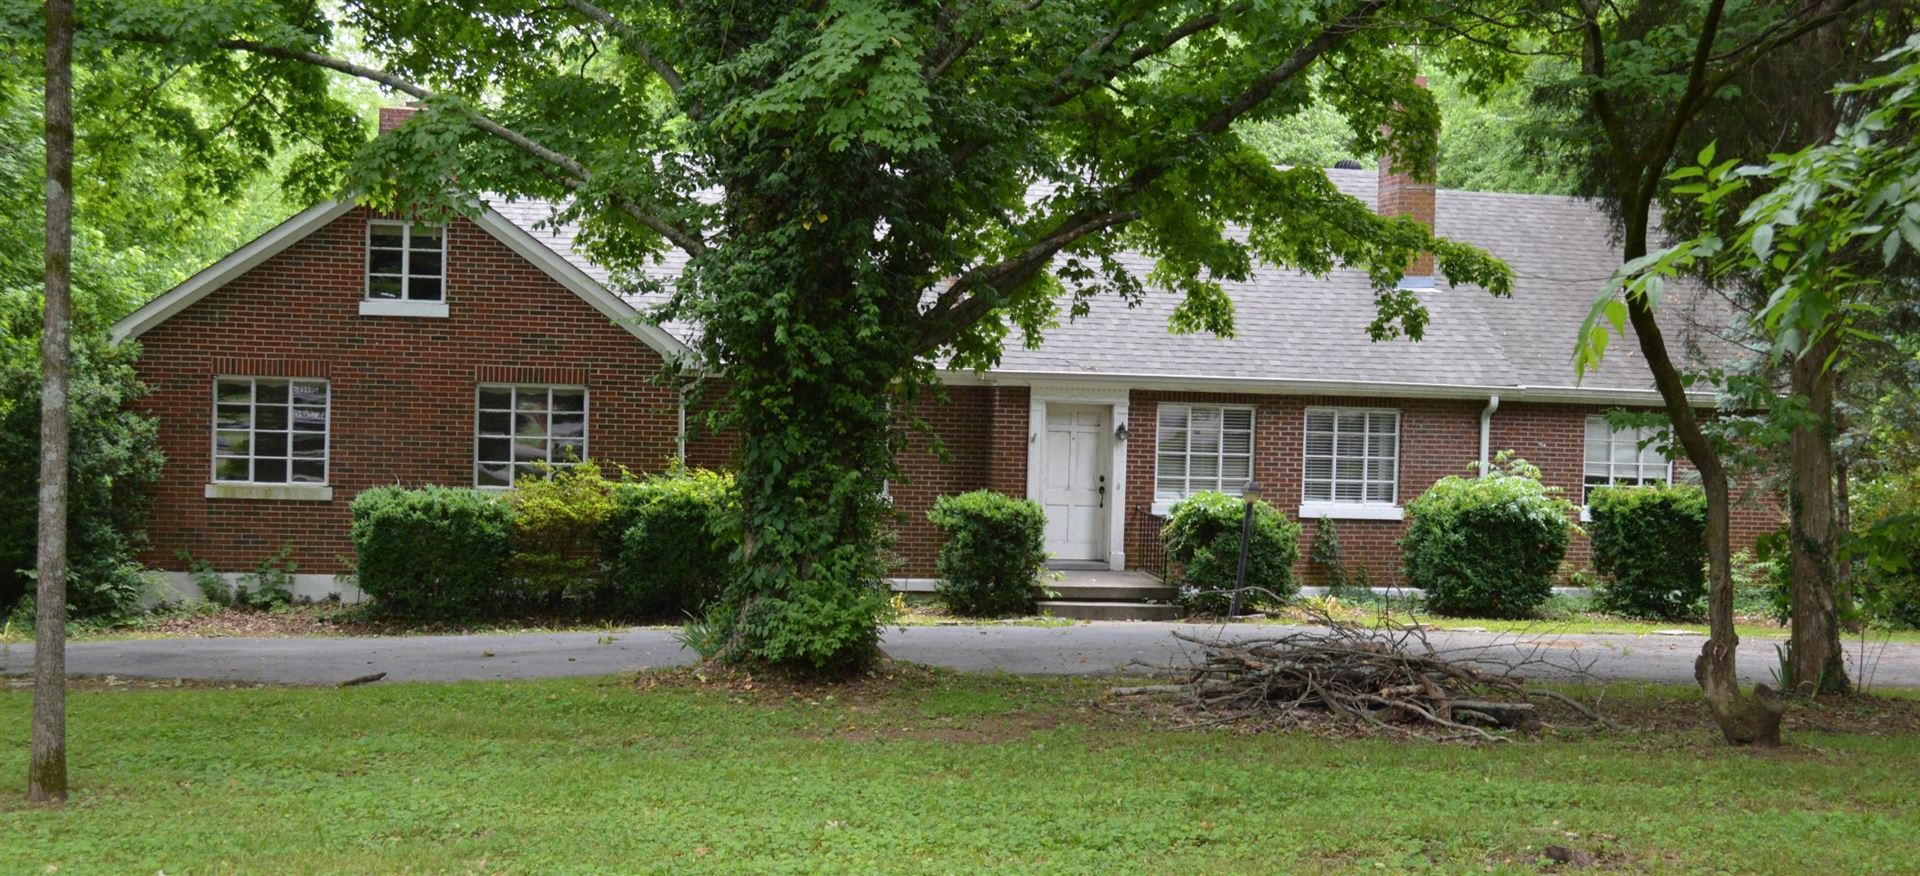 4015 Trotwood Avenue, Columbia, TN 38401 - MLS#: 2163976